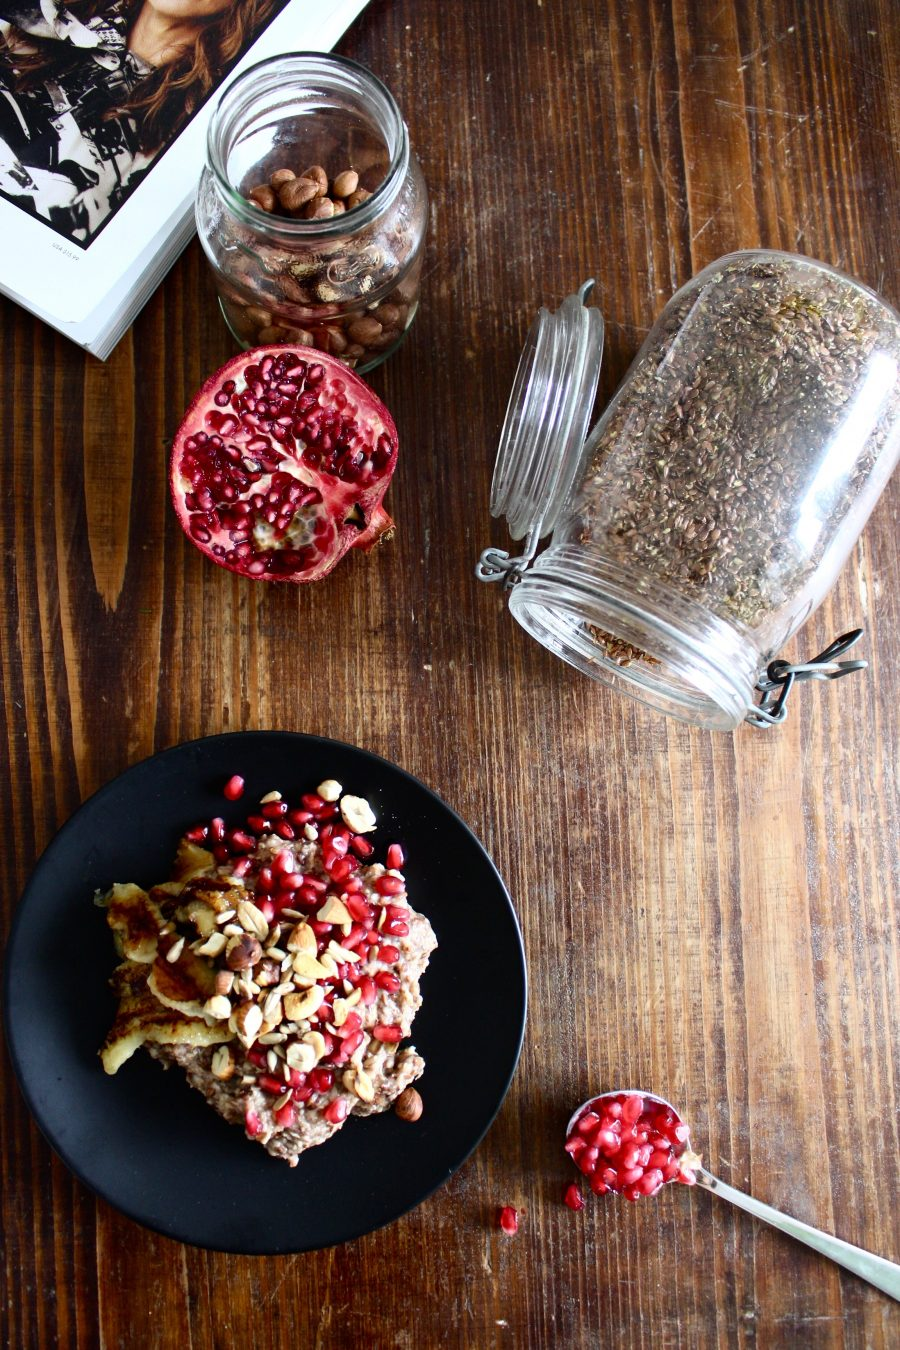 Porridge with fried Bananas & Pomegranate